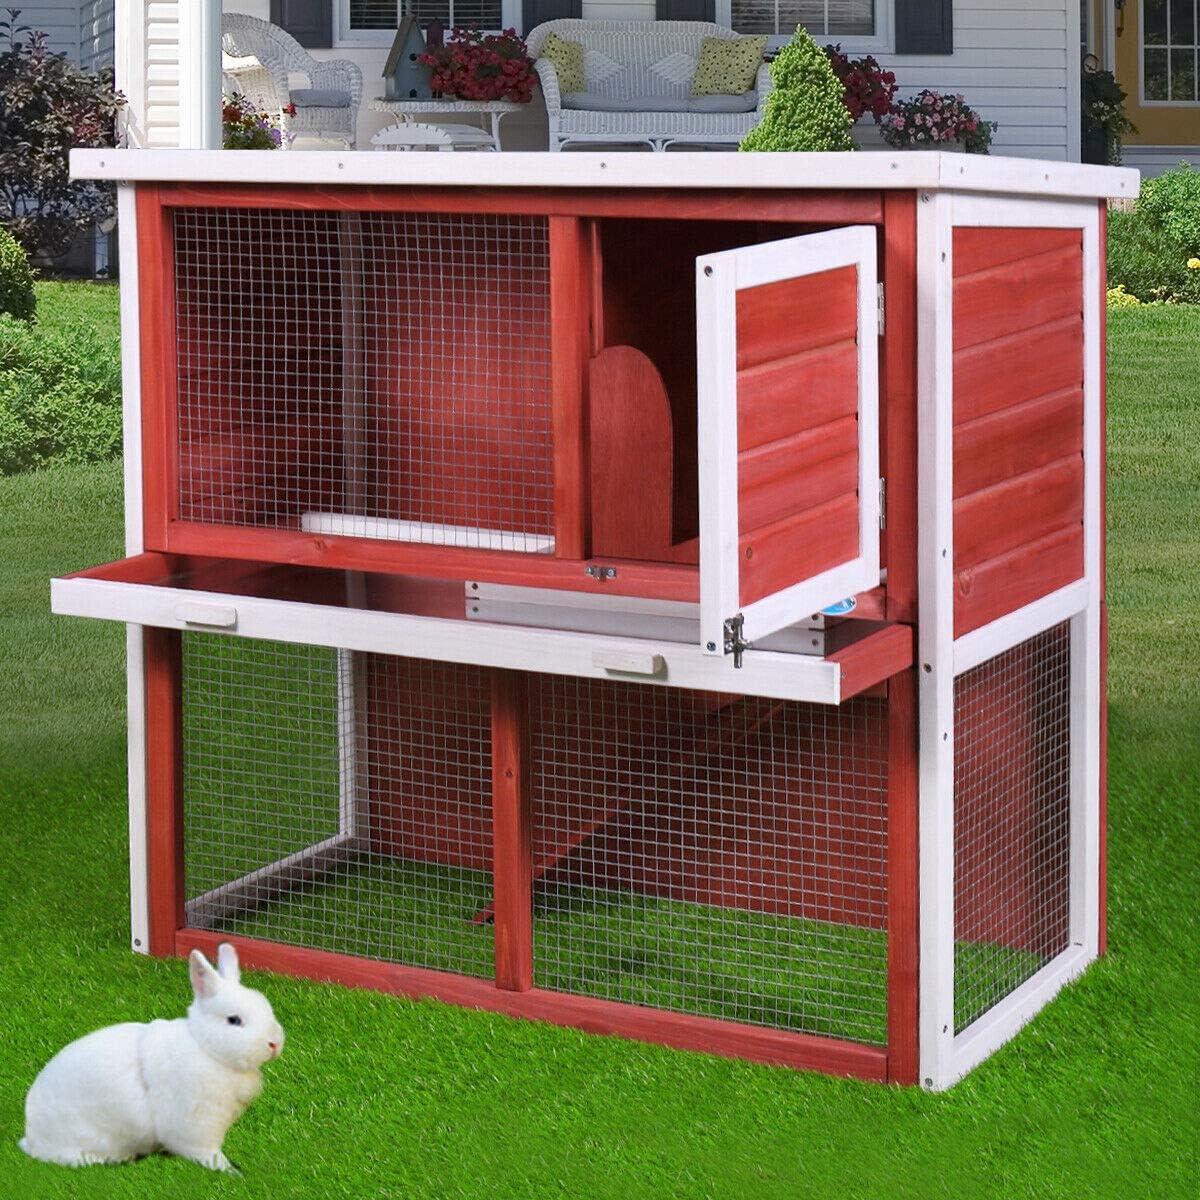 2ci Yanz Indoor Outdoor Year-end annual account Rabbit Hutch Finally popular brand 36